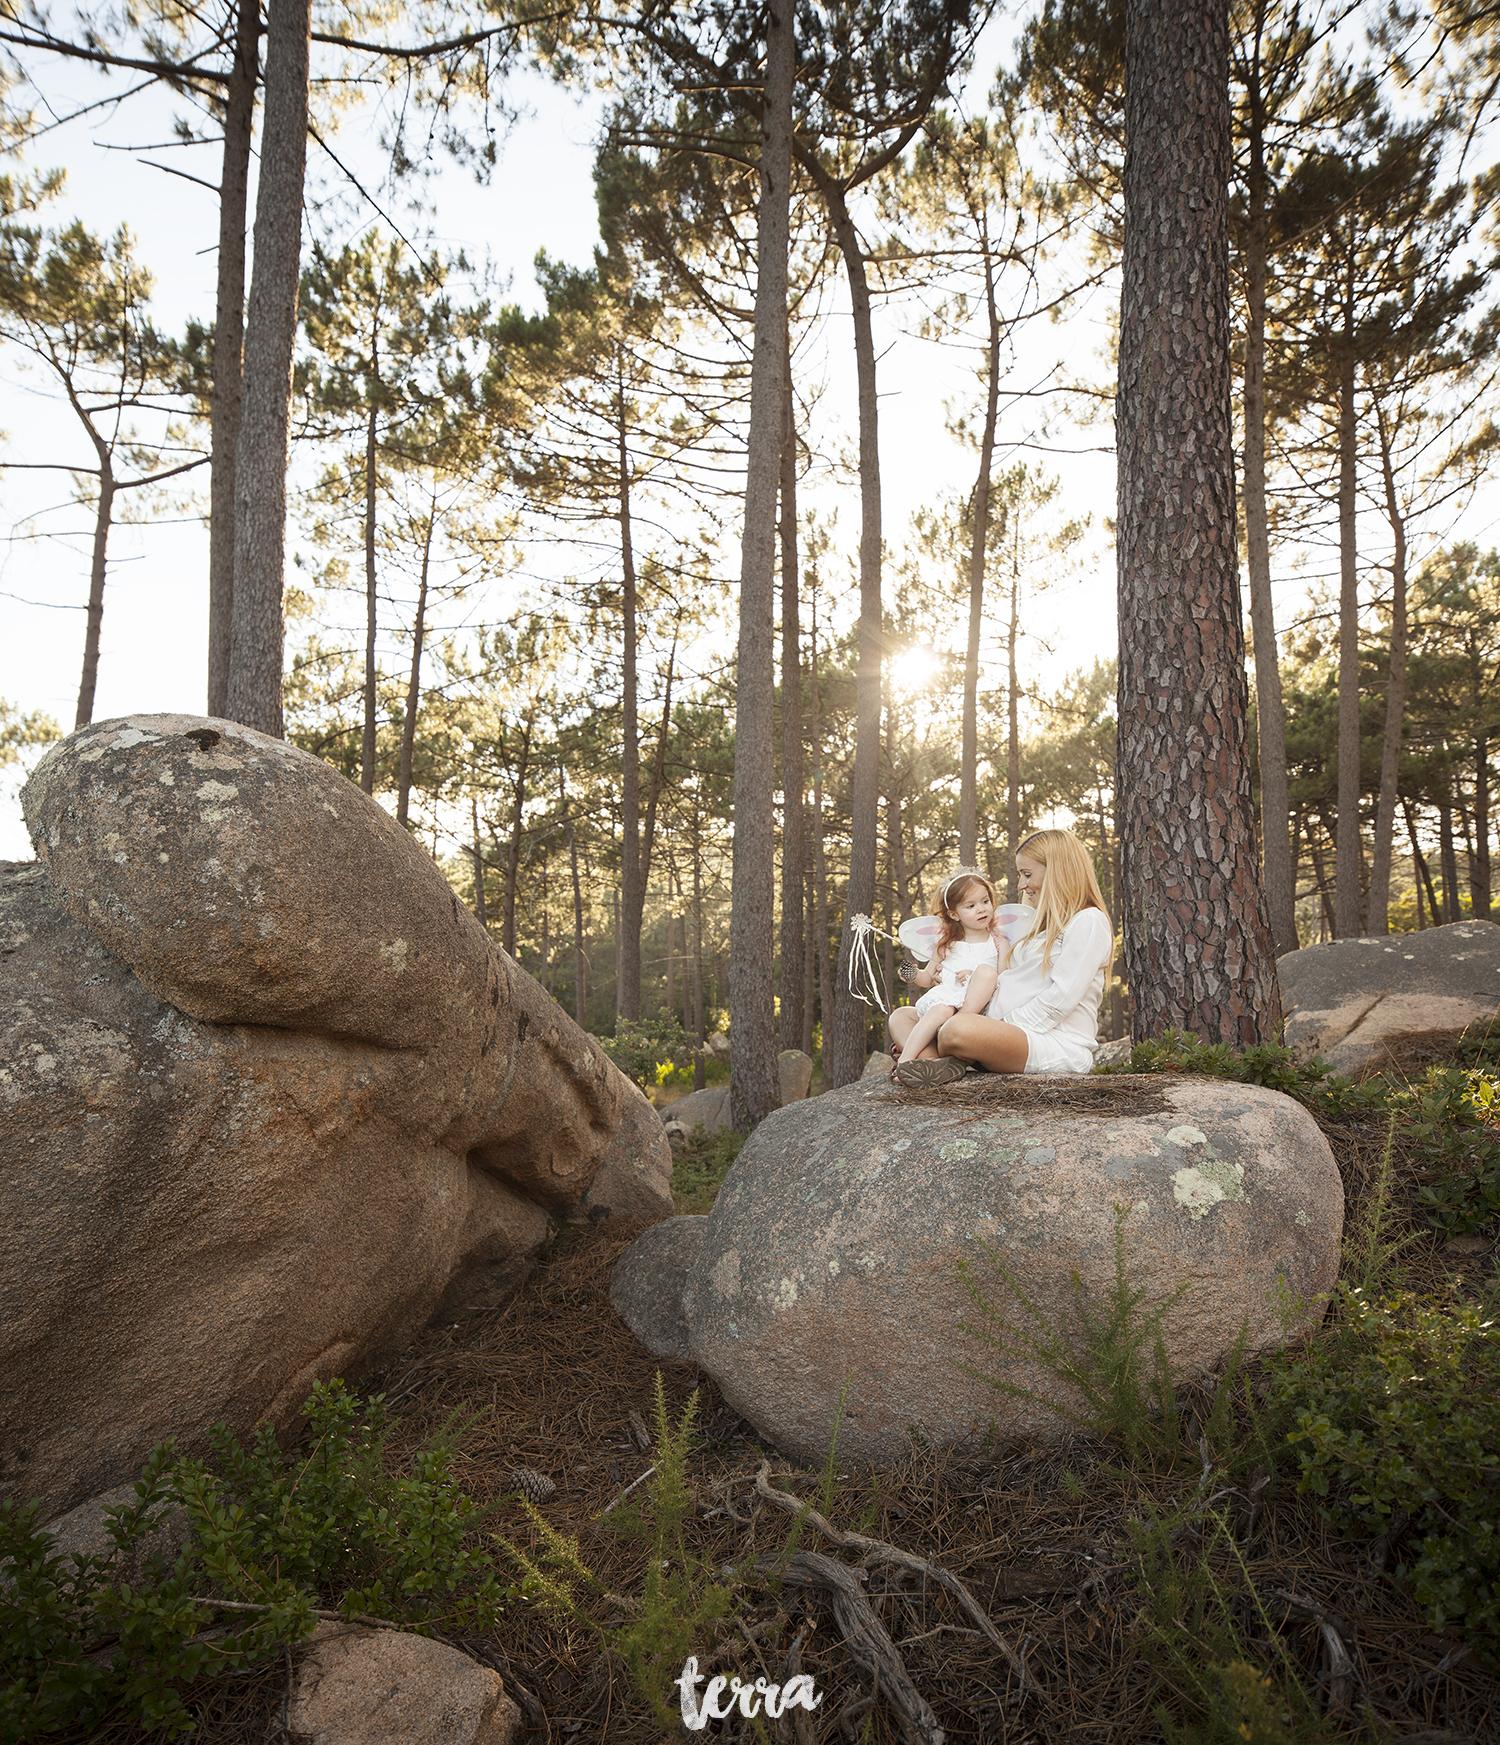 sessao-fotografica-gravidez-familia-serra-sintra-terra-fotografia-008.jpg